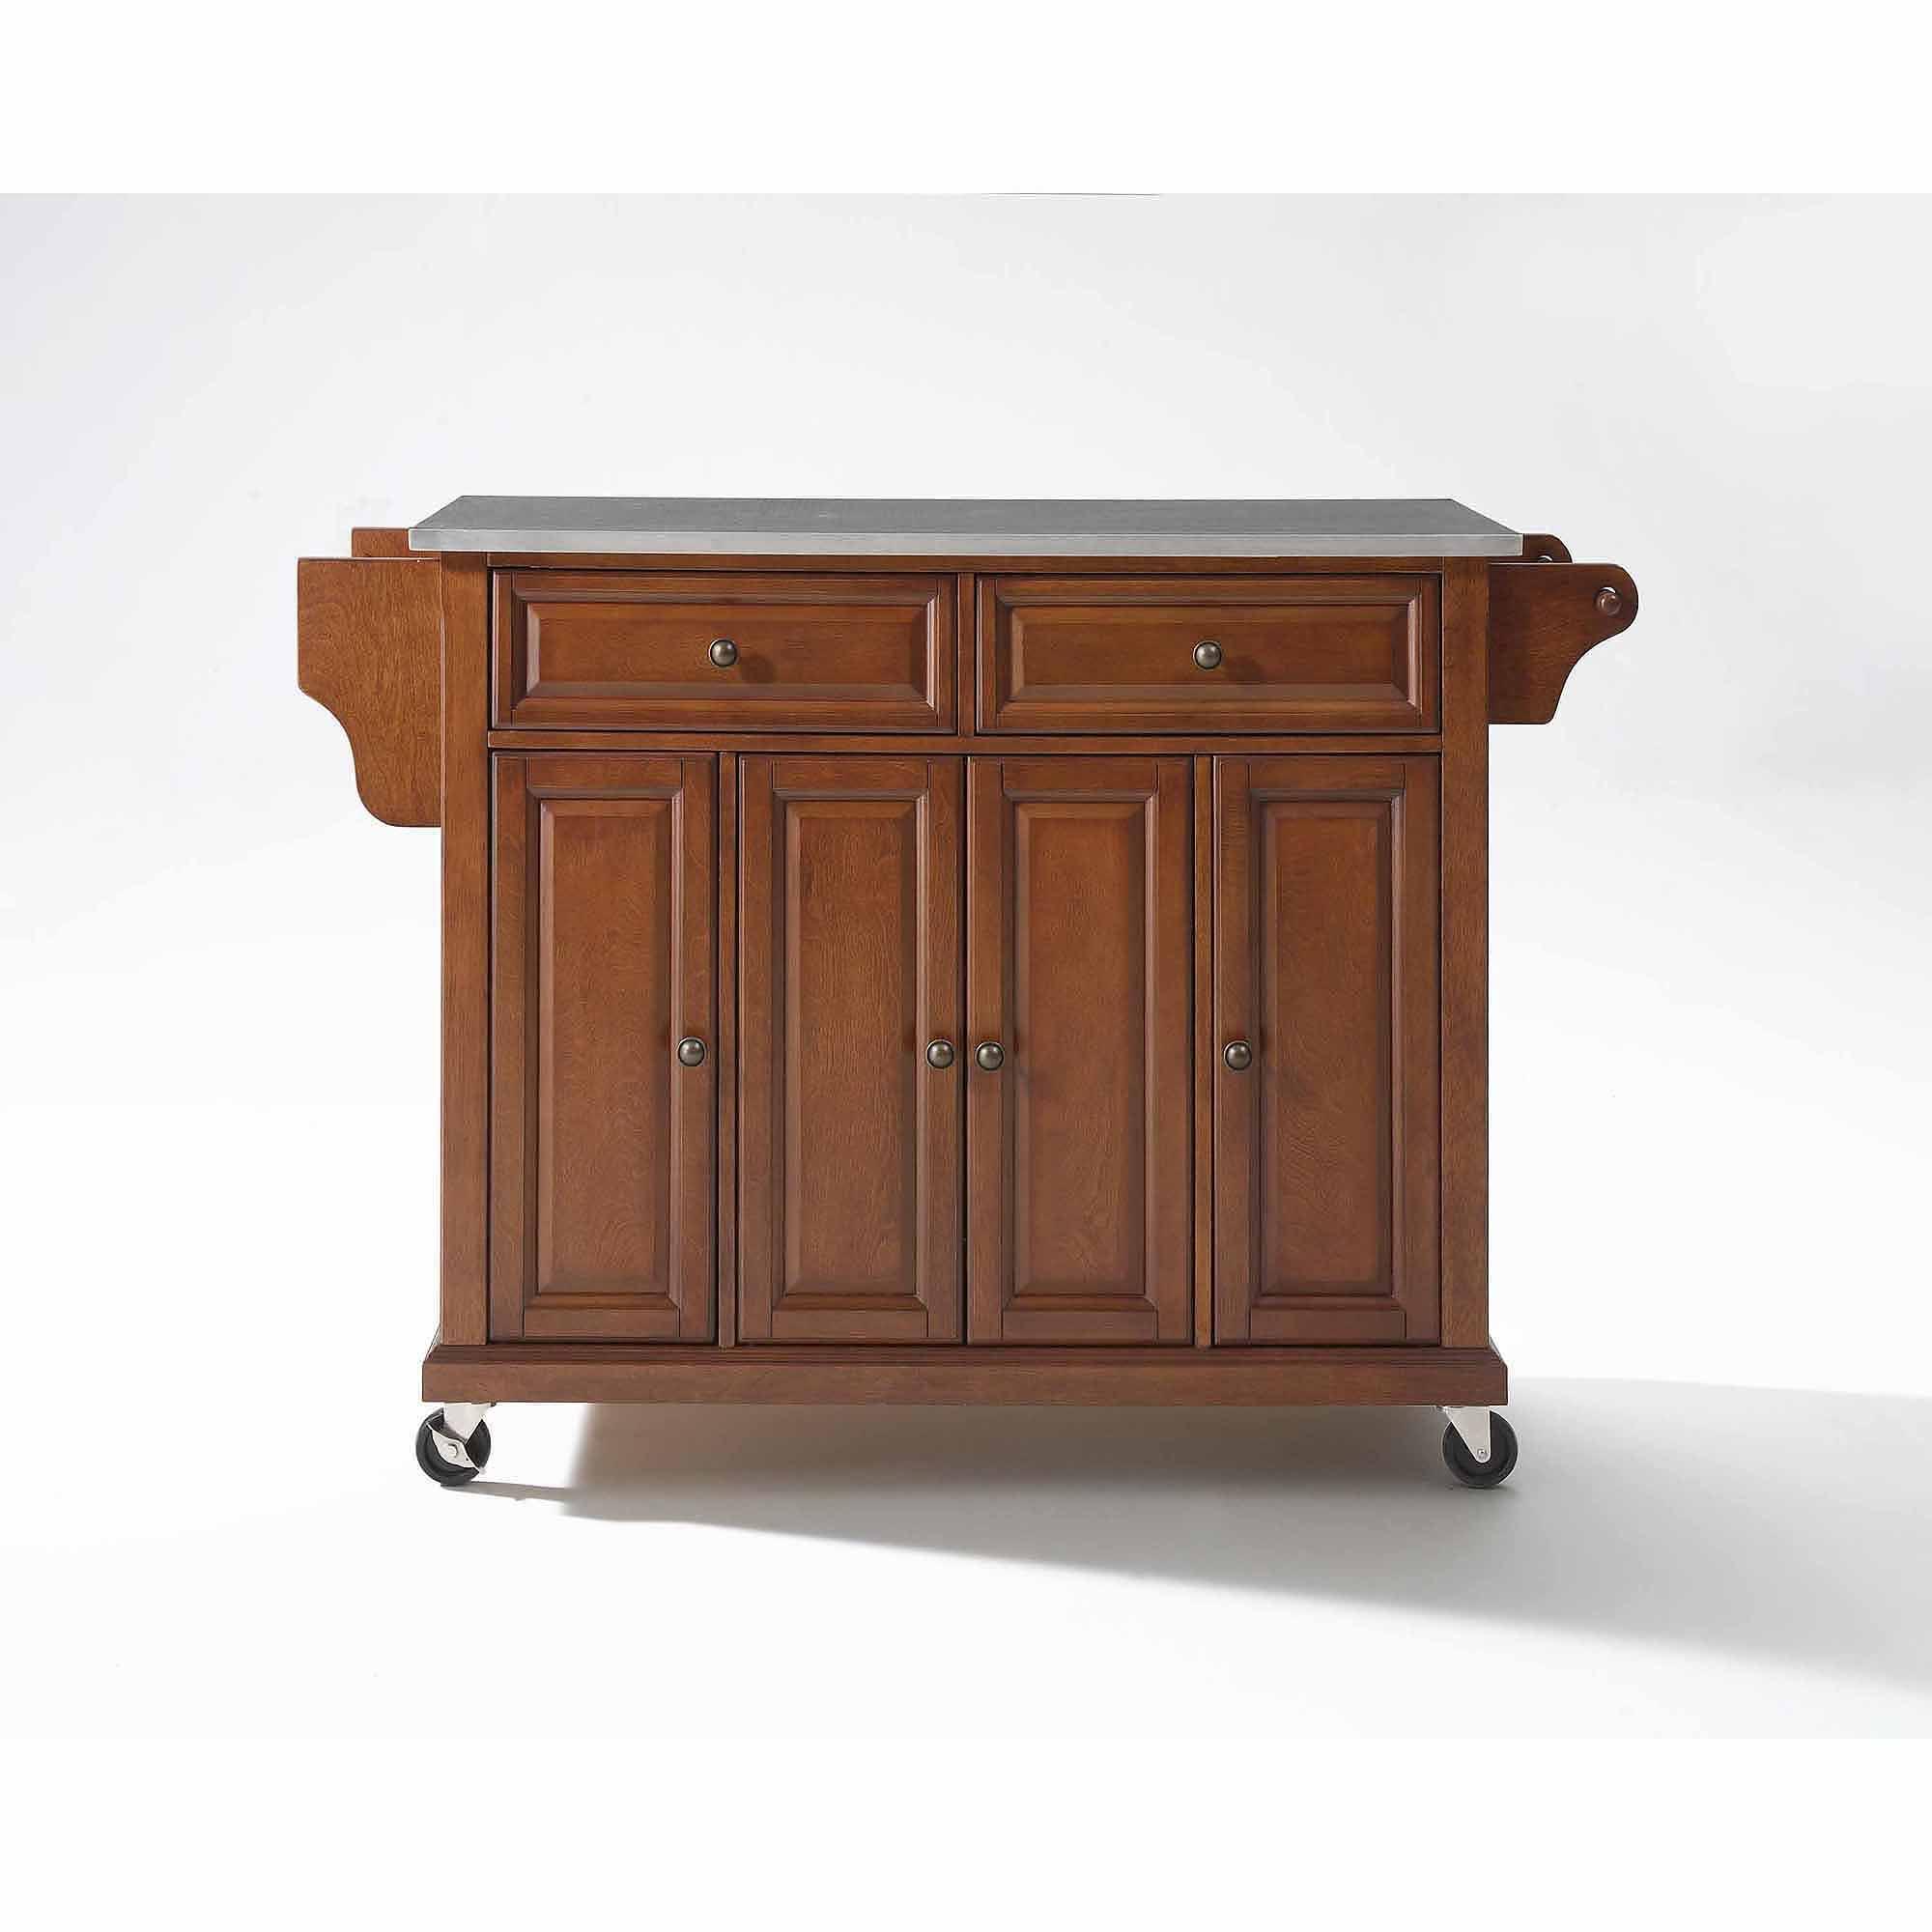 crosley furniture stainless steel top kitchen cart walmart